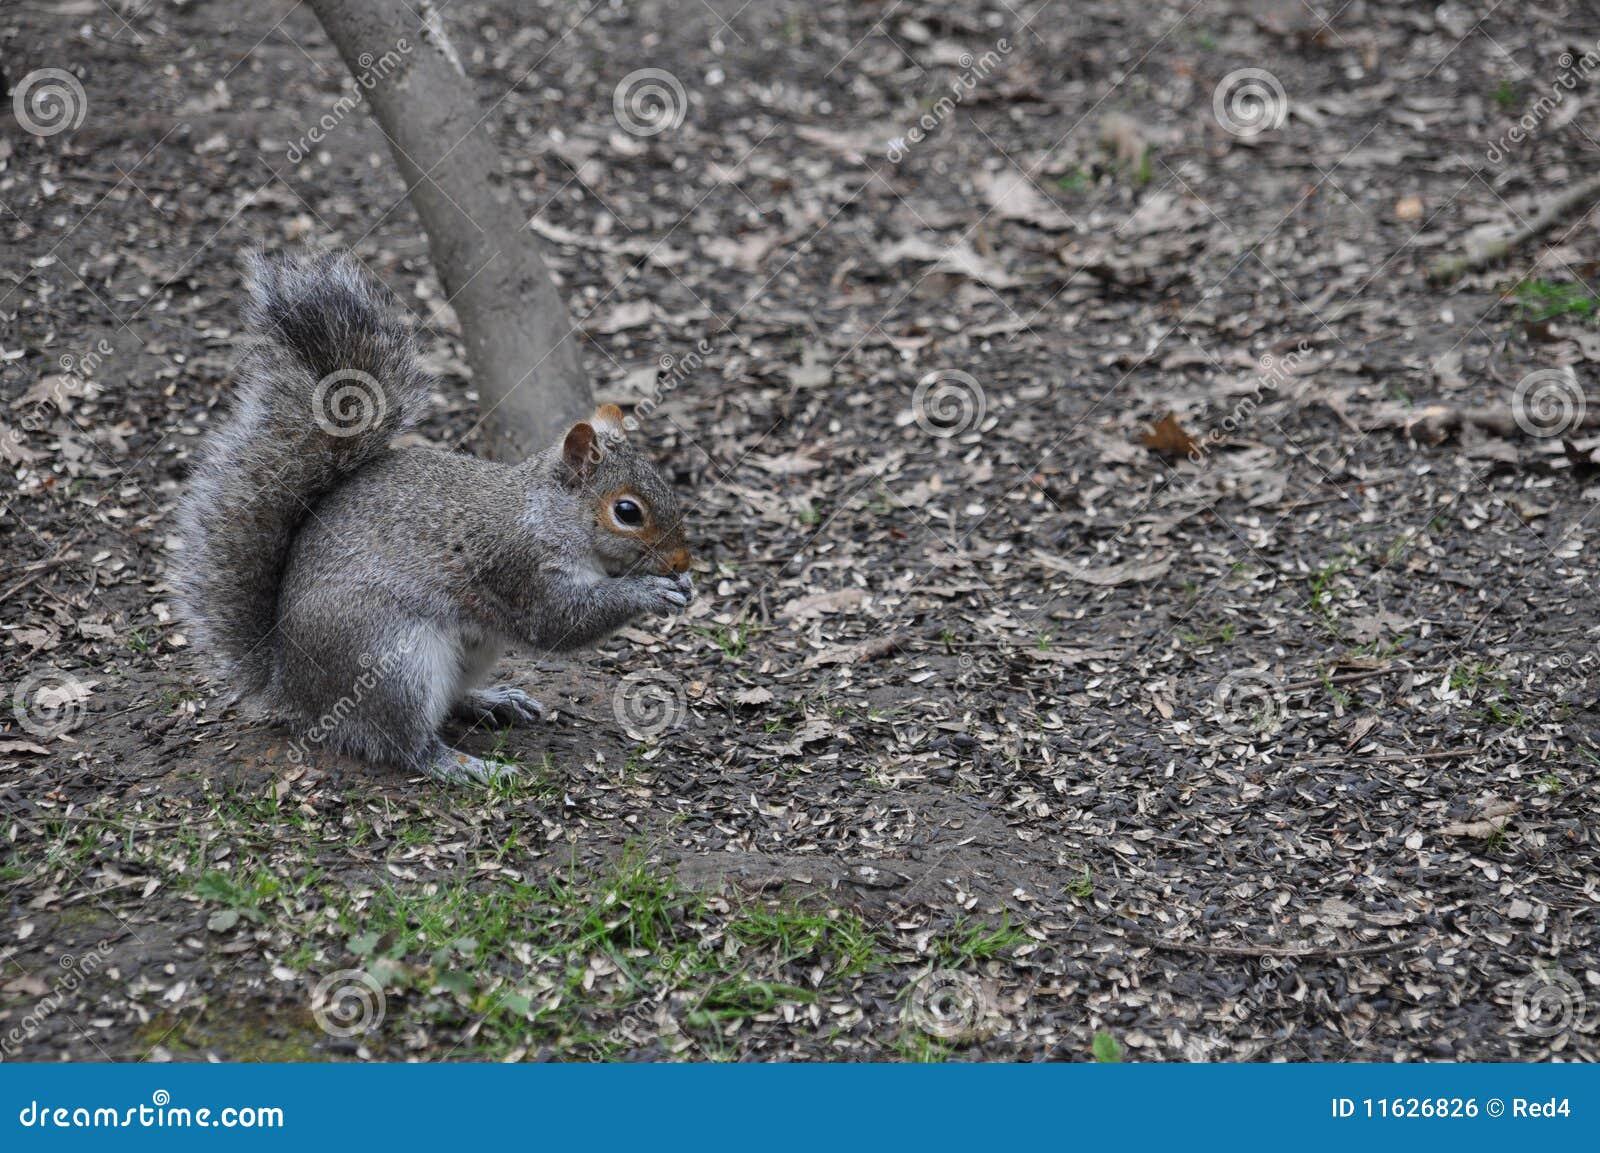 Baby Ground Squirrel Food